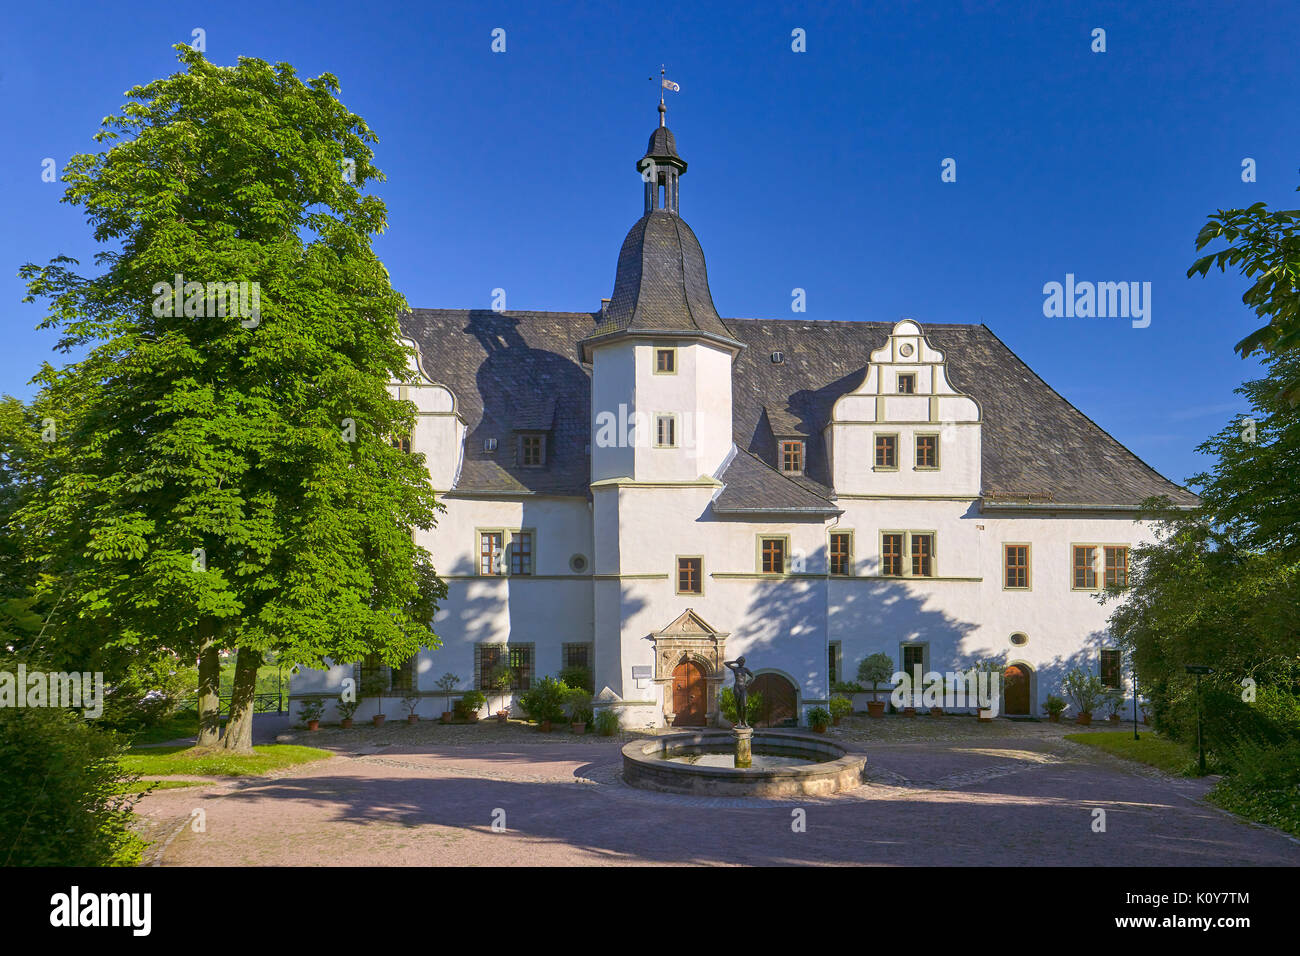 Renaissance castle of the Dornburg castles, Dornburg, Thuringia, Germany - Stock Image